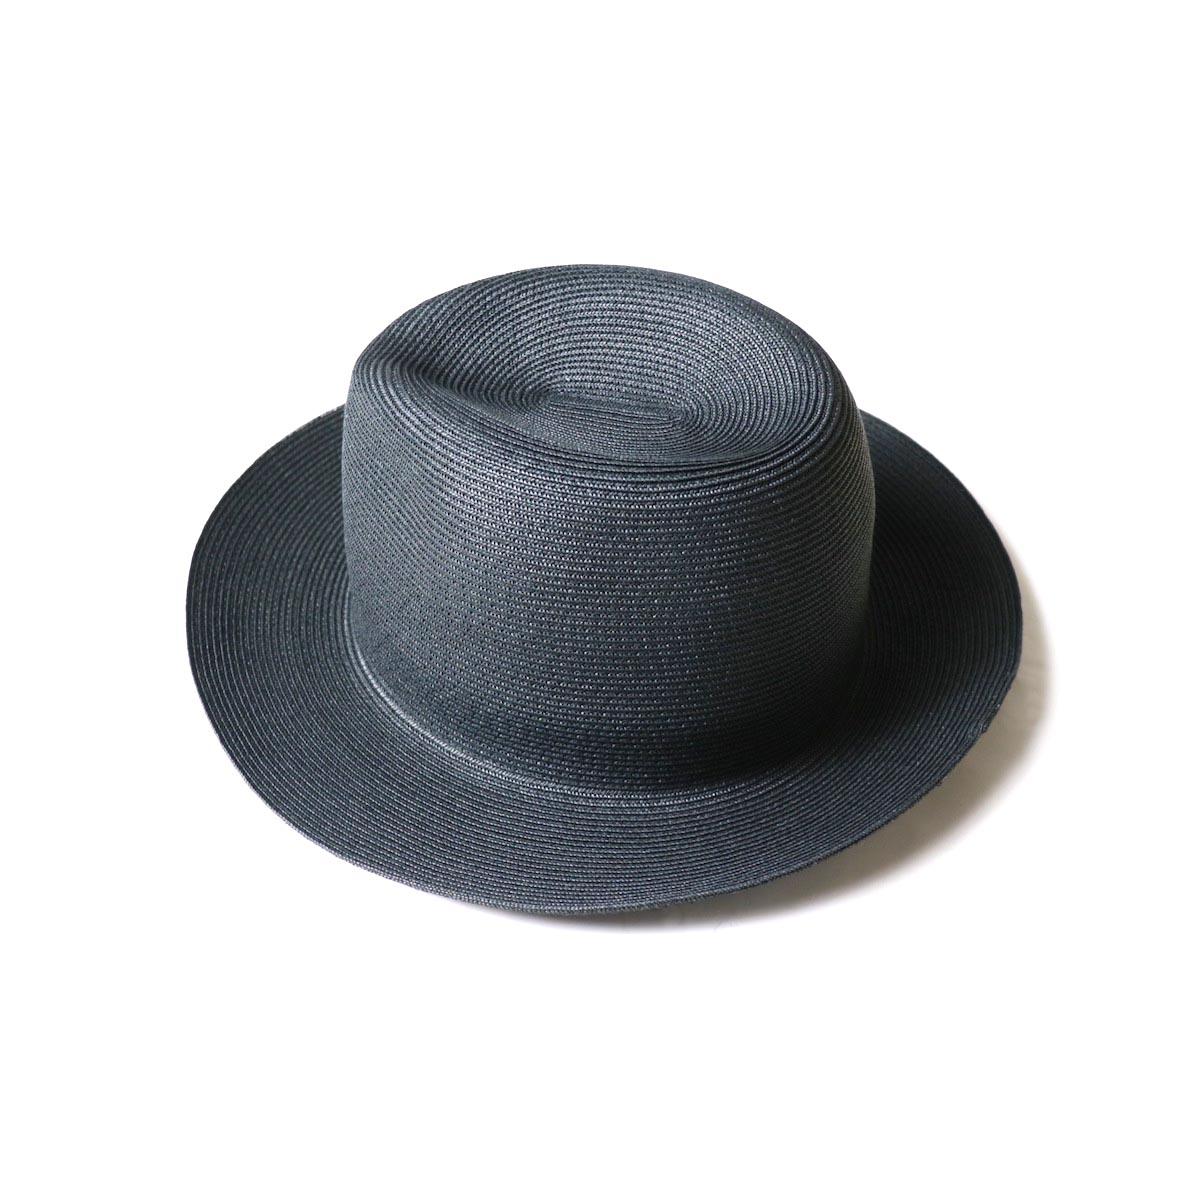 KIJIMA TAKAYUKI / Paper Hat (E-211004)black 斜め後ろ